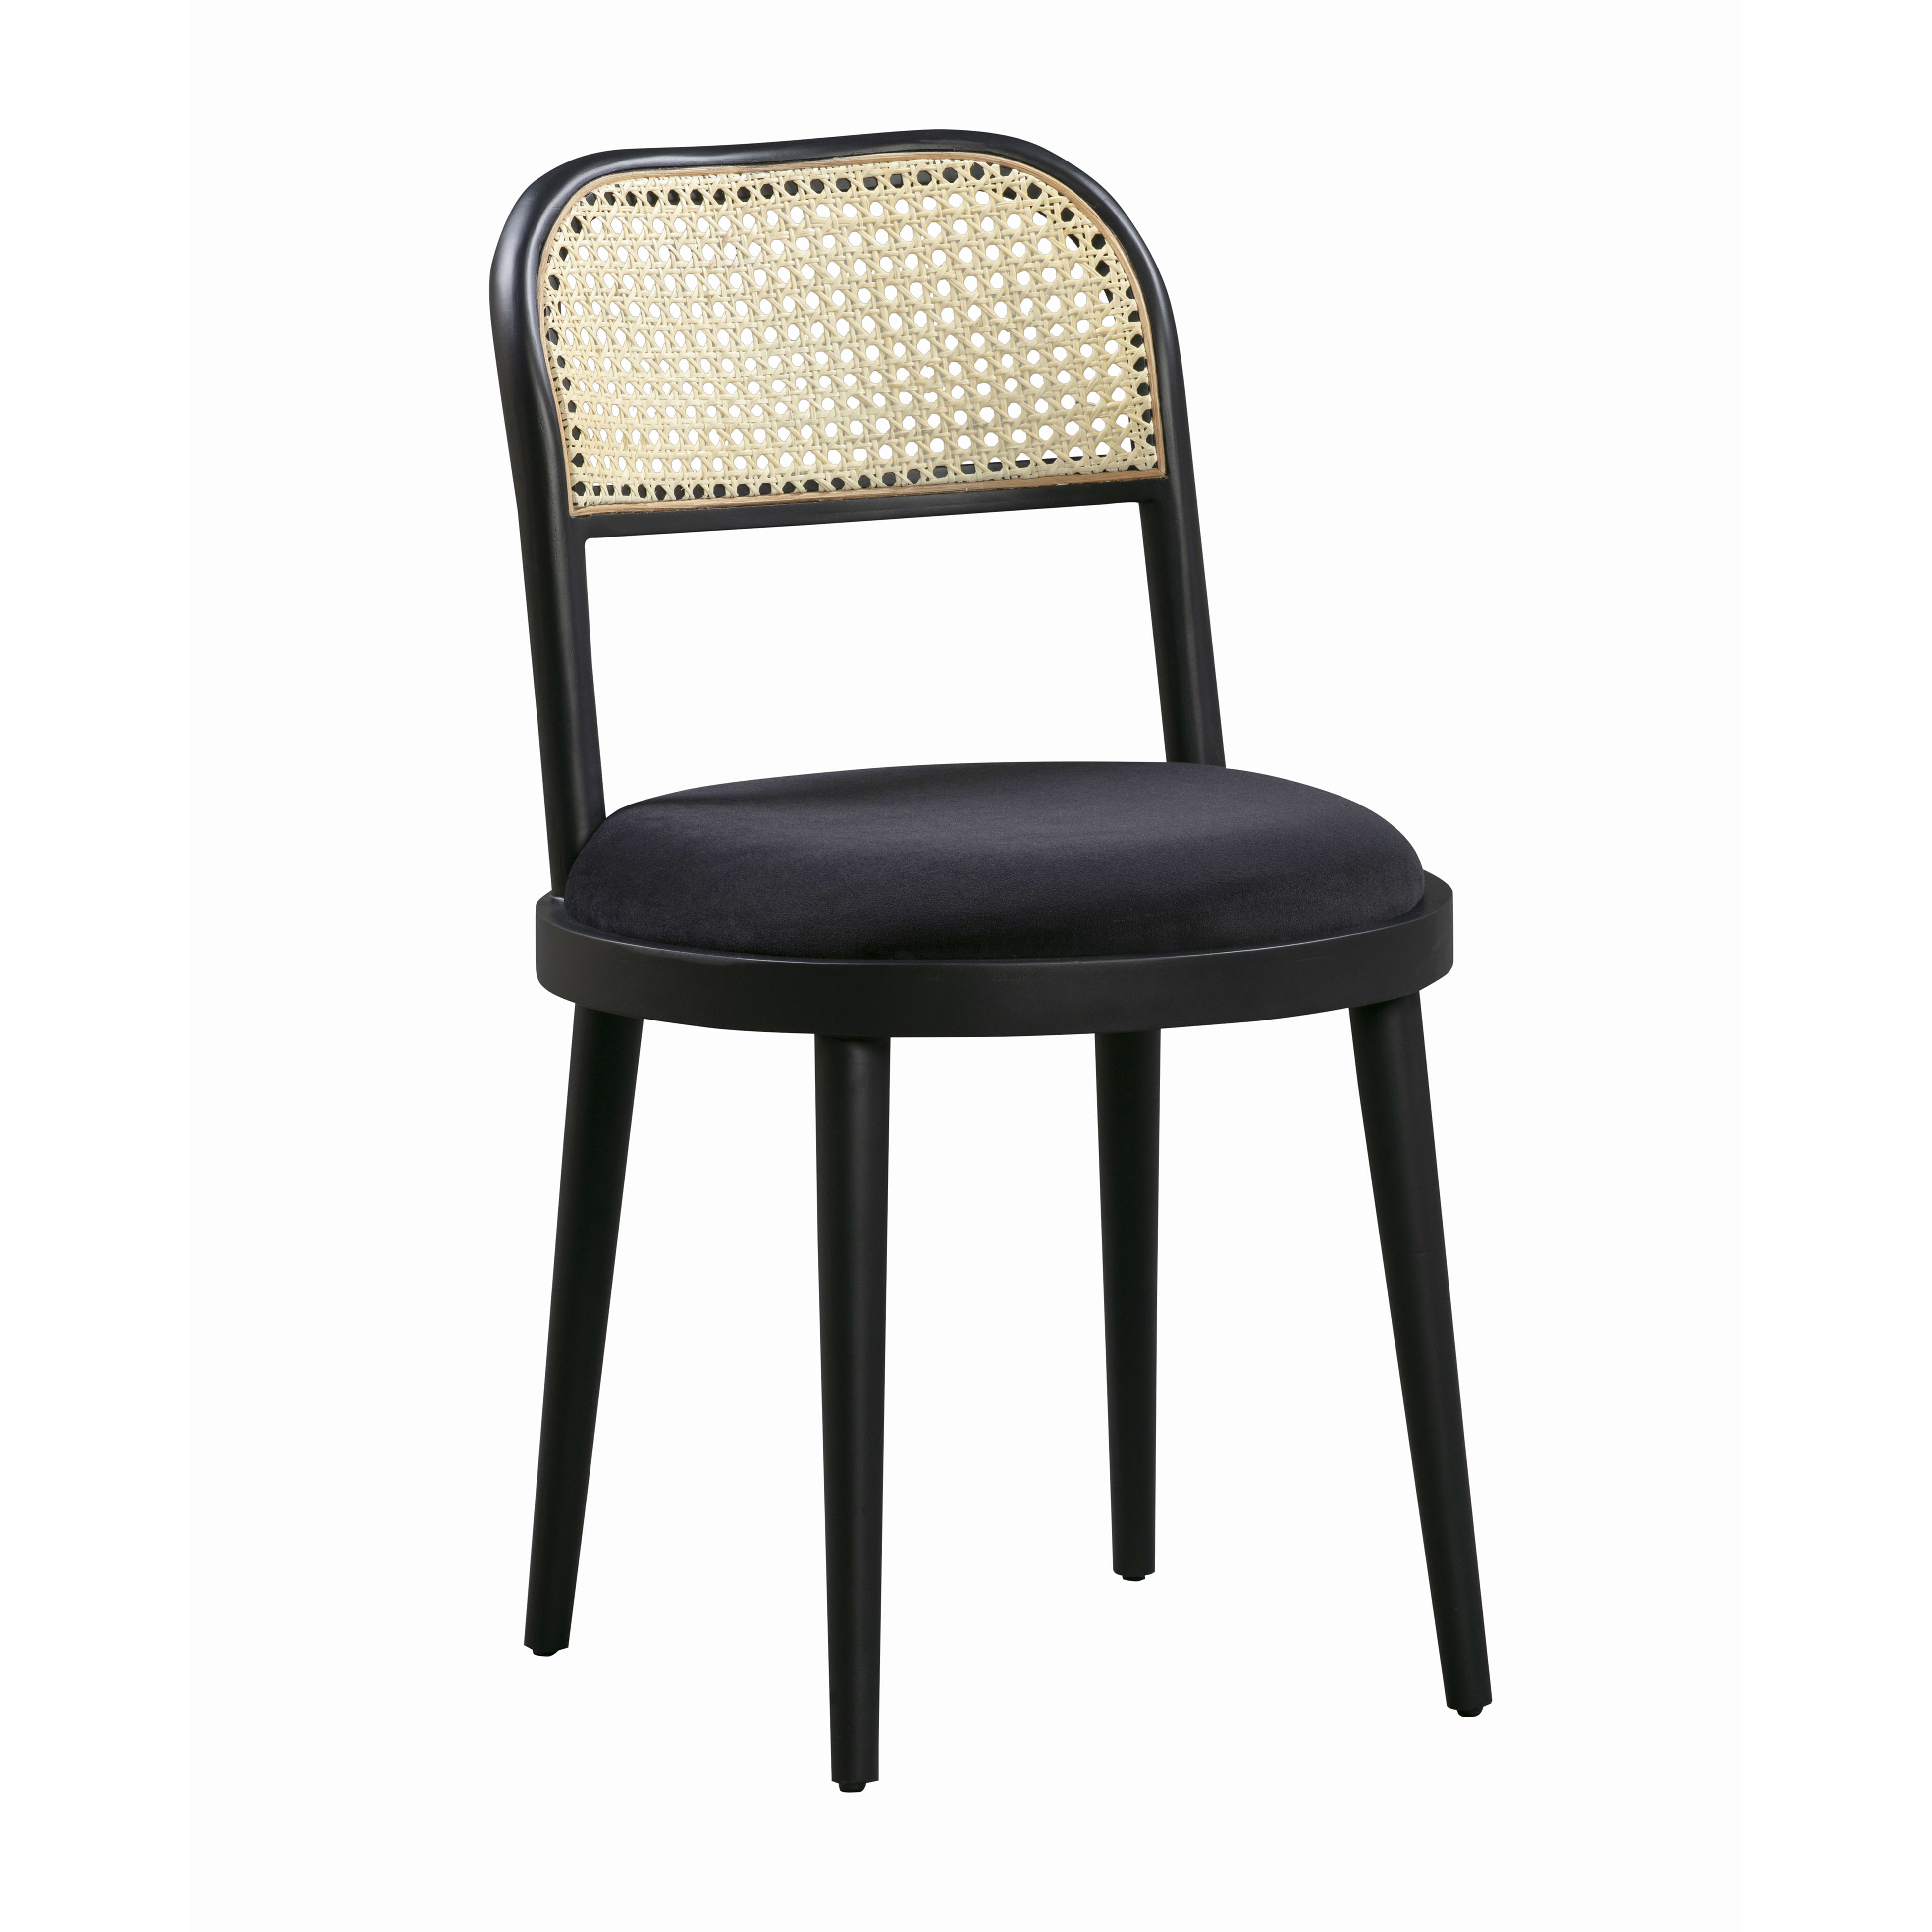 Shiba Cane Dining Chair